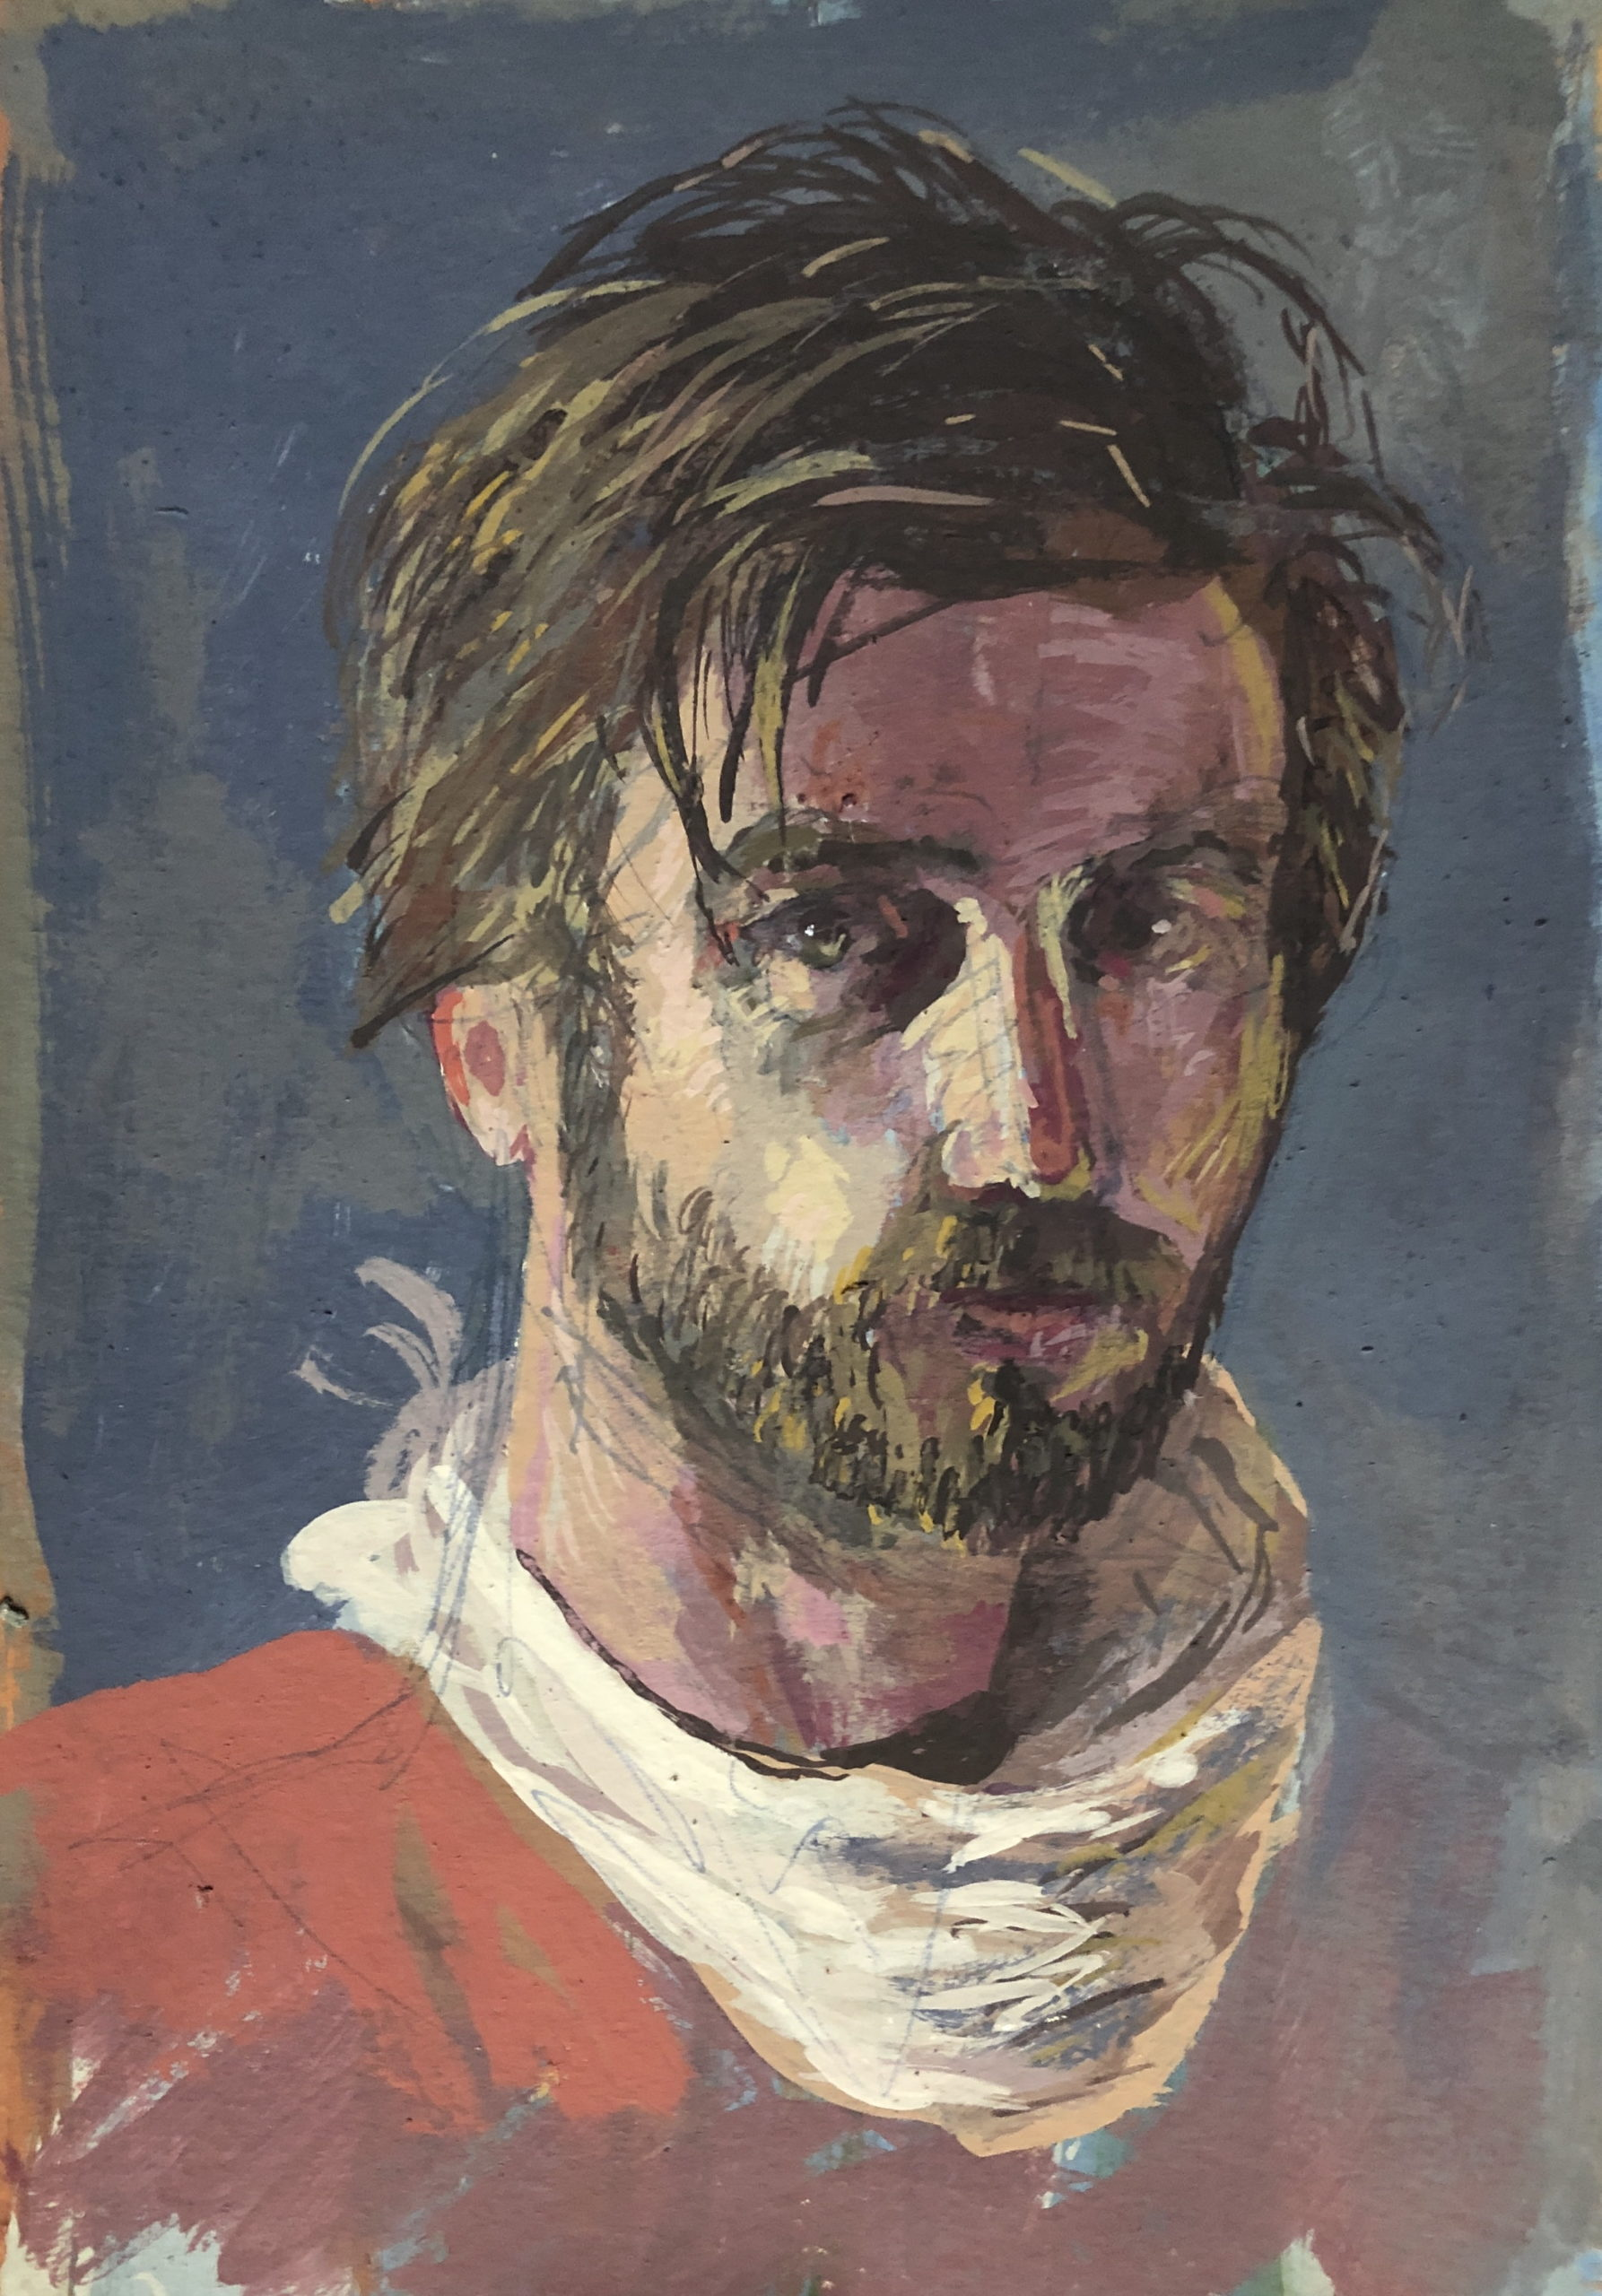 SELF PORTRAIT WITH WHITE HANDKERCHIEF by JOHN JAMESON